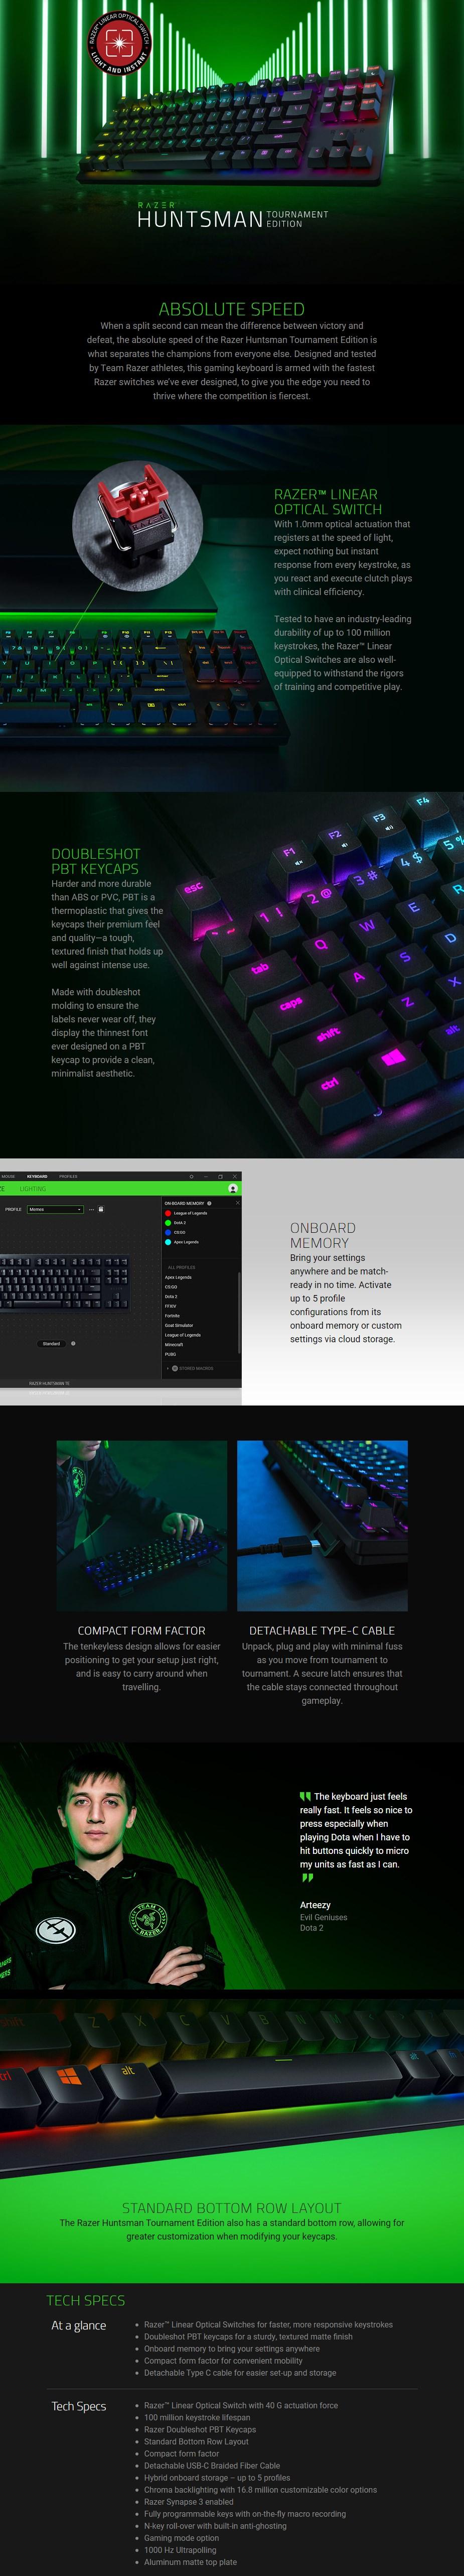 Razer Huntsman Tournament Edition TKL Gaming Keyboard - Linear Optical Switch - Overview 1